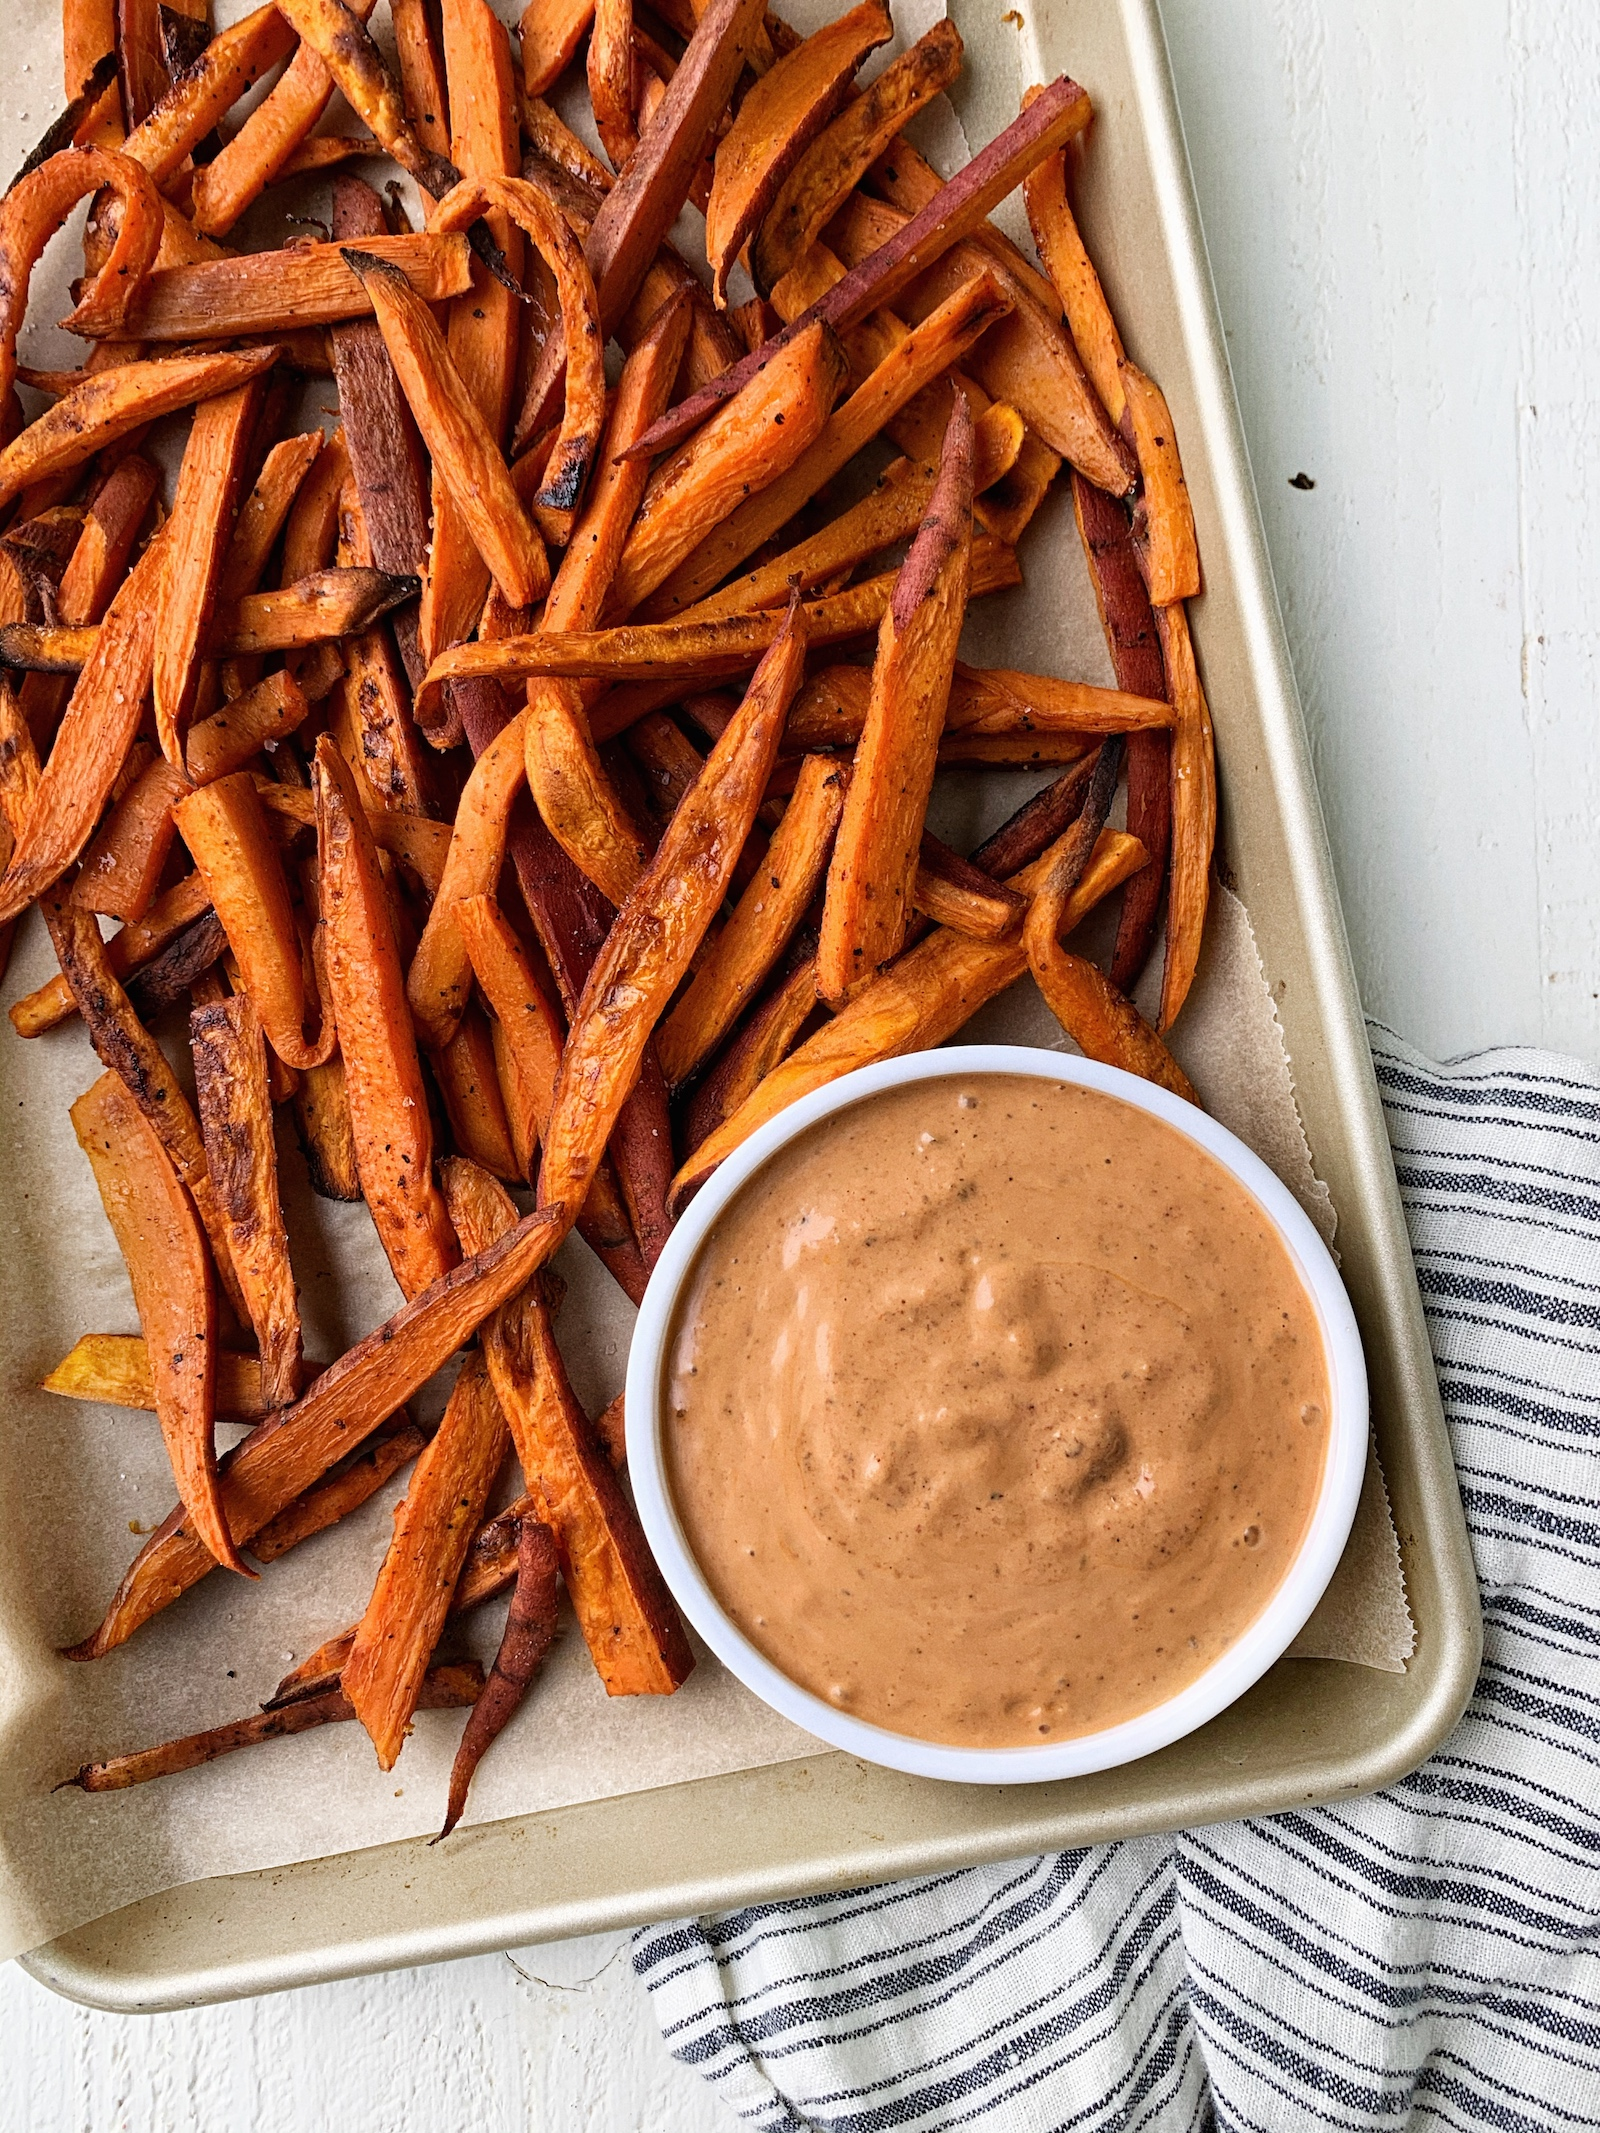 Easiest Way To Bake Sweet Potato Fries